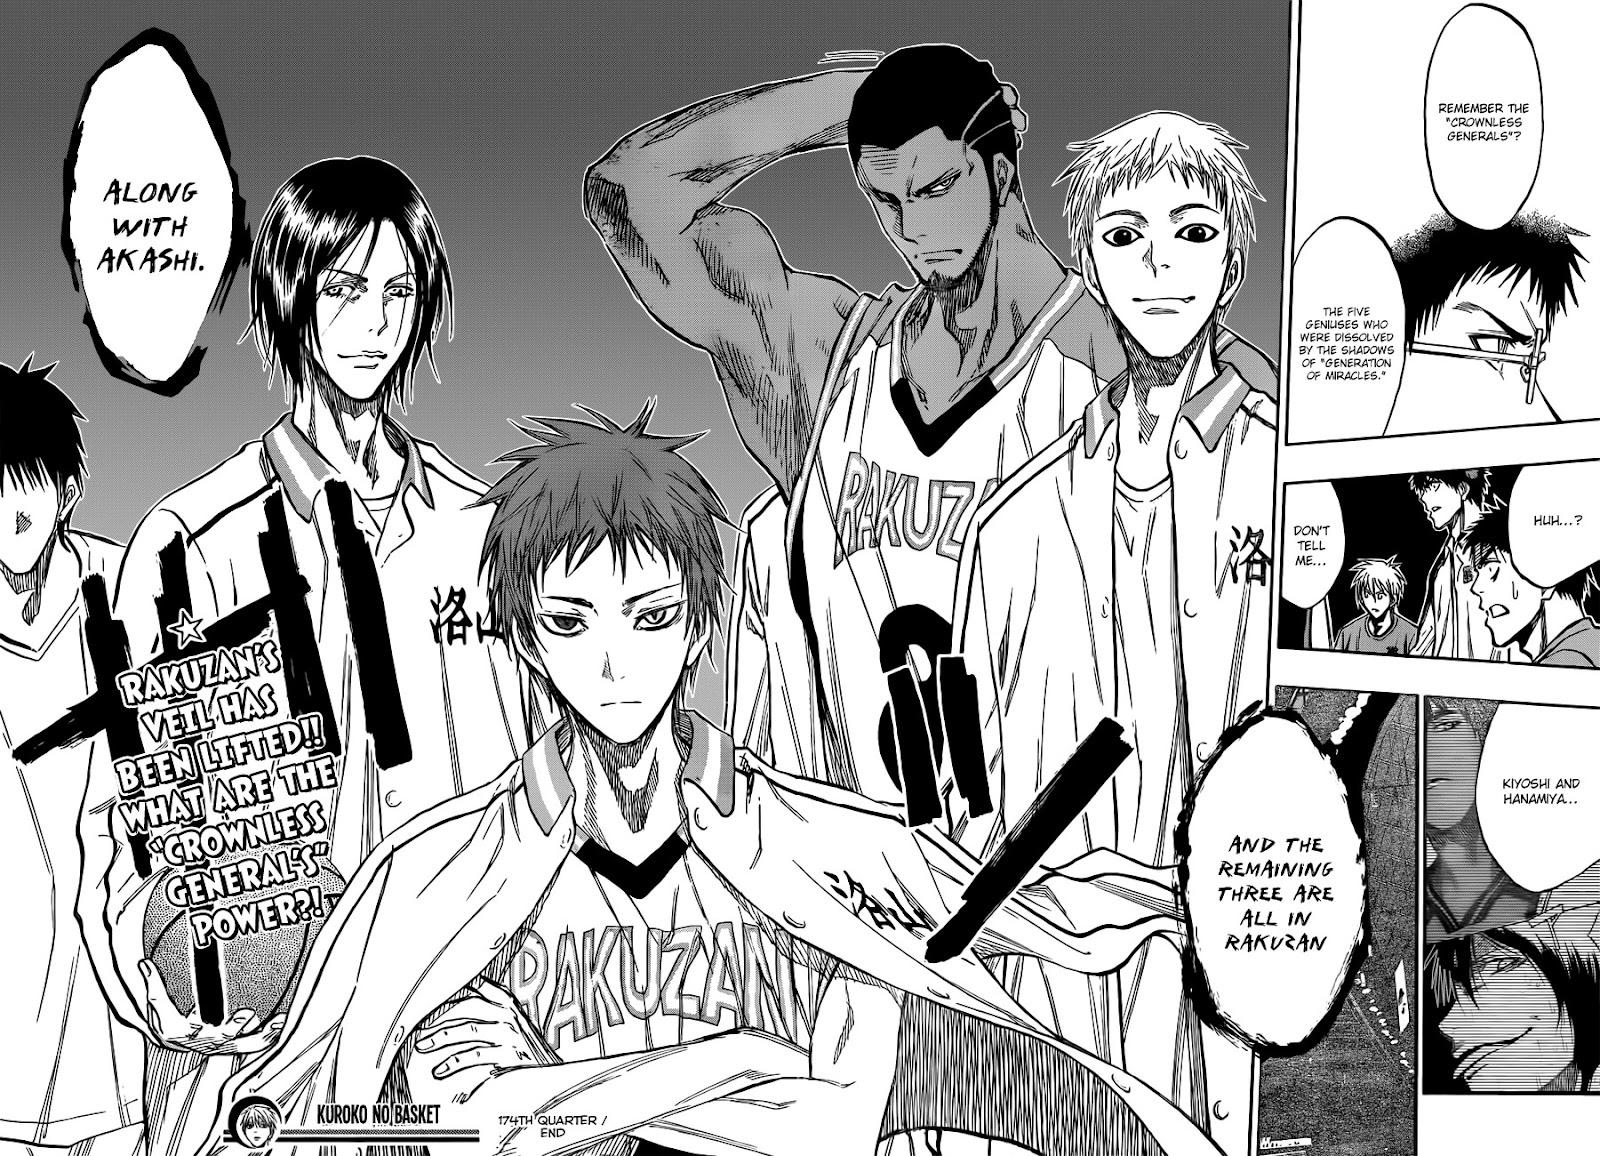 Kuroko no Basket Manga Chapter 174 - Image 18-19